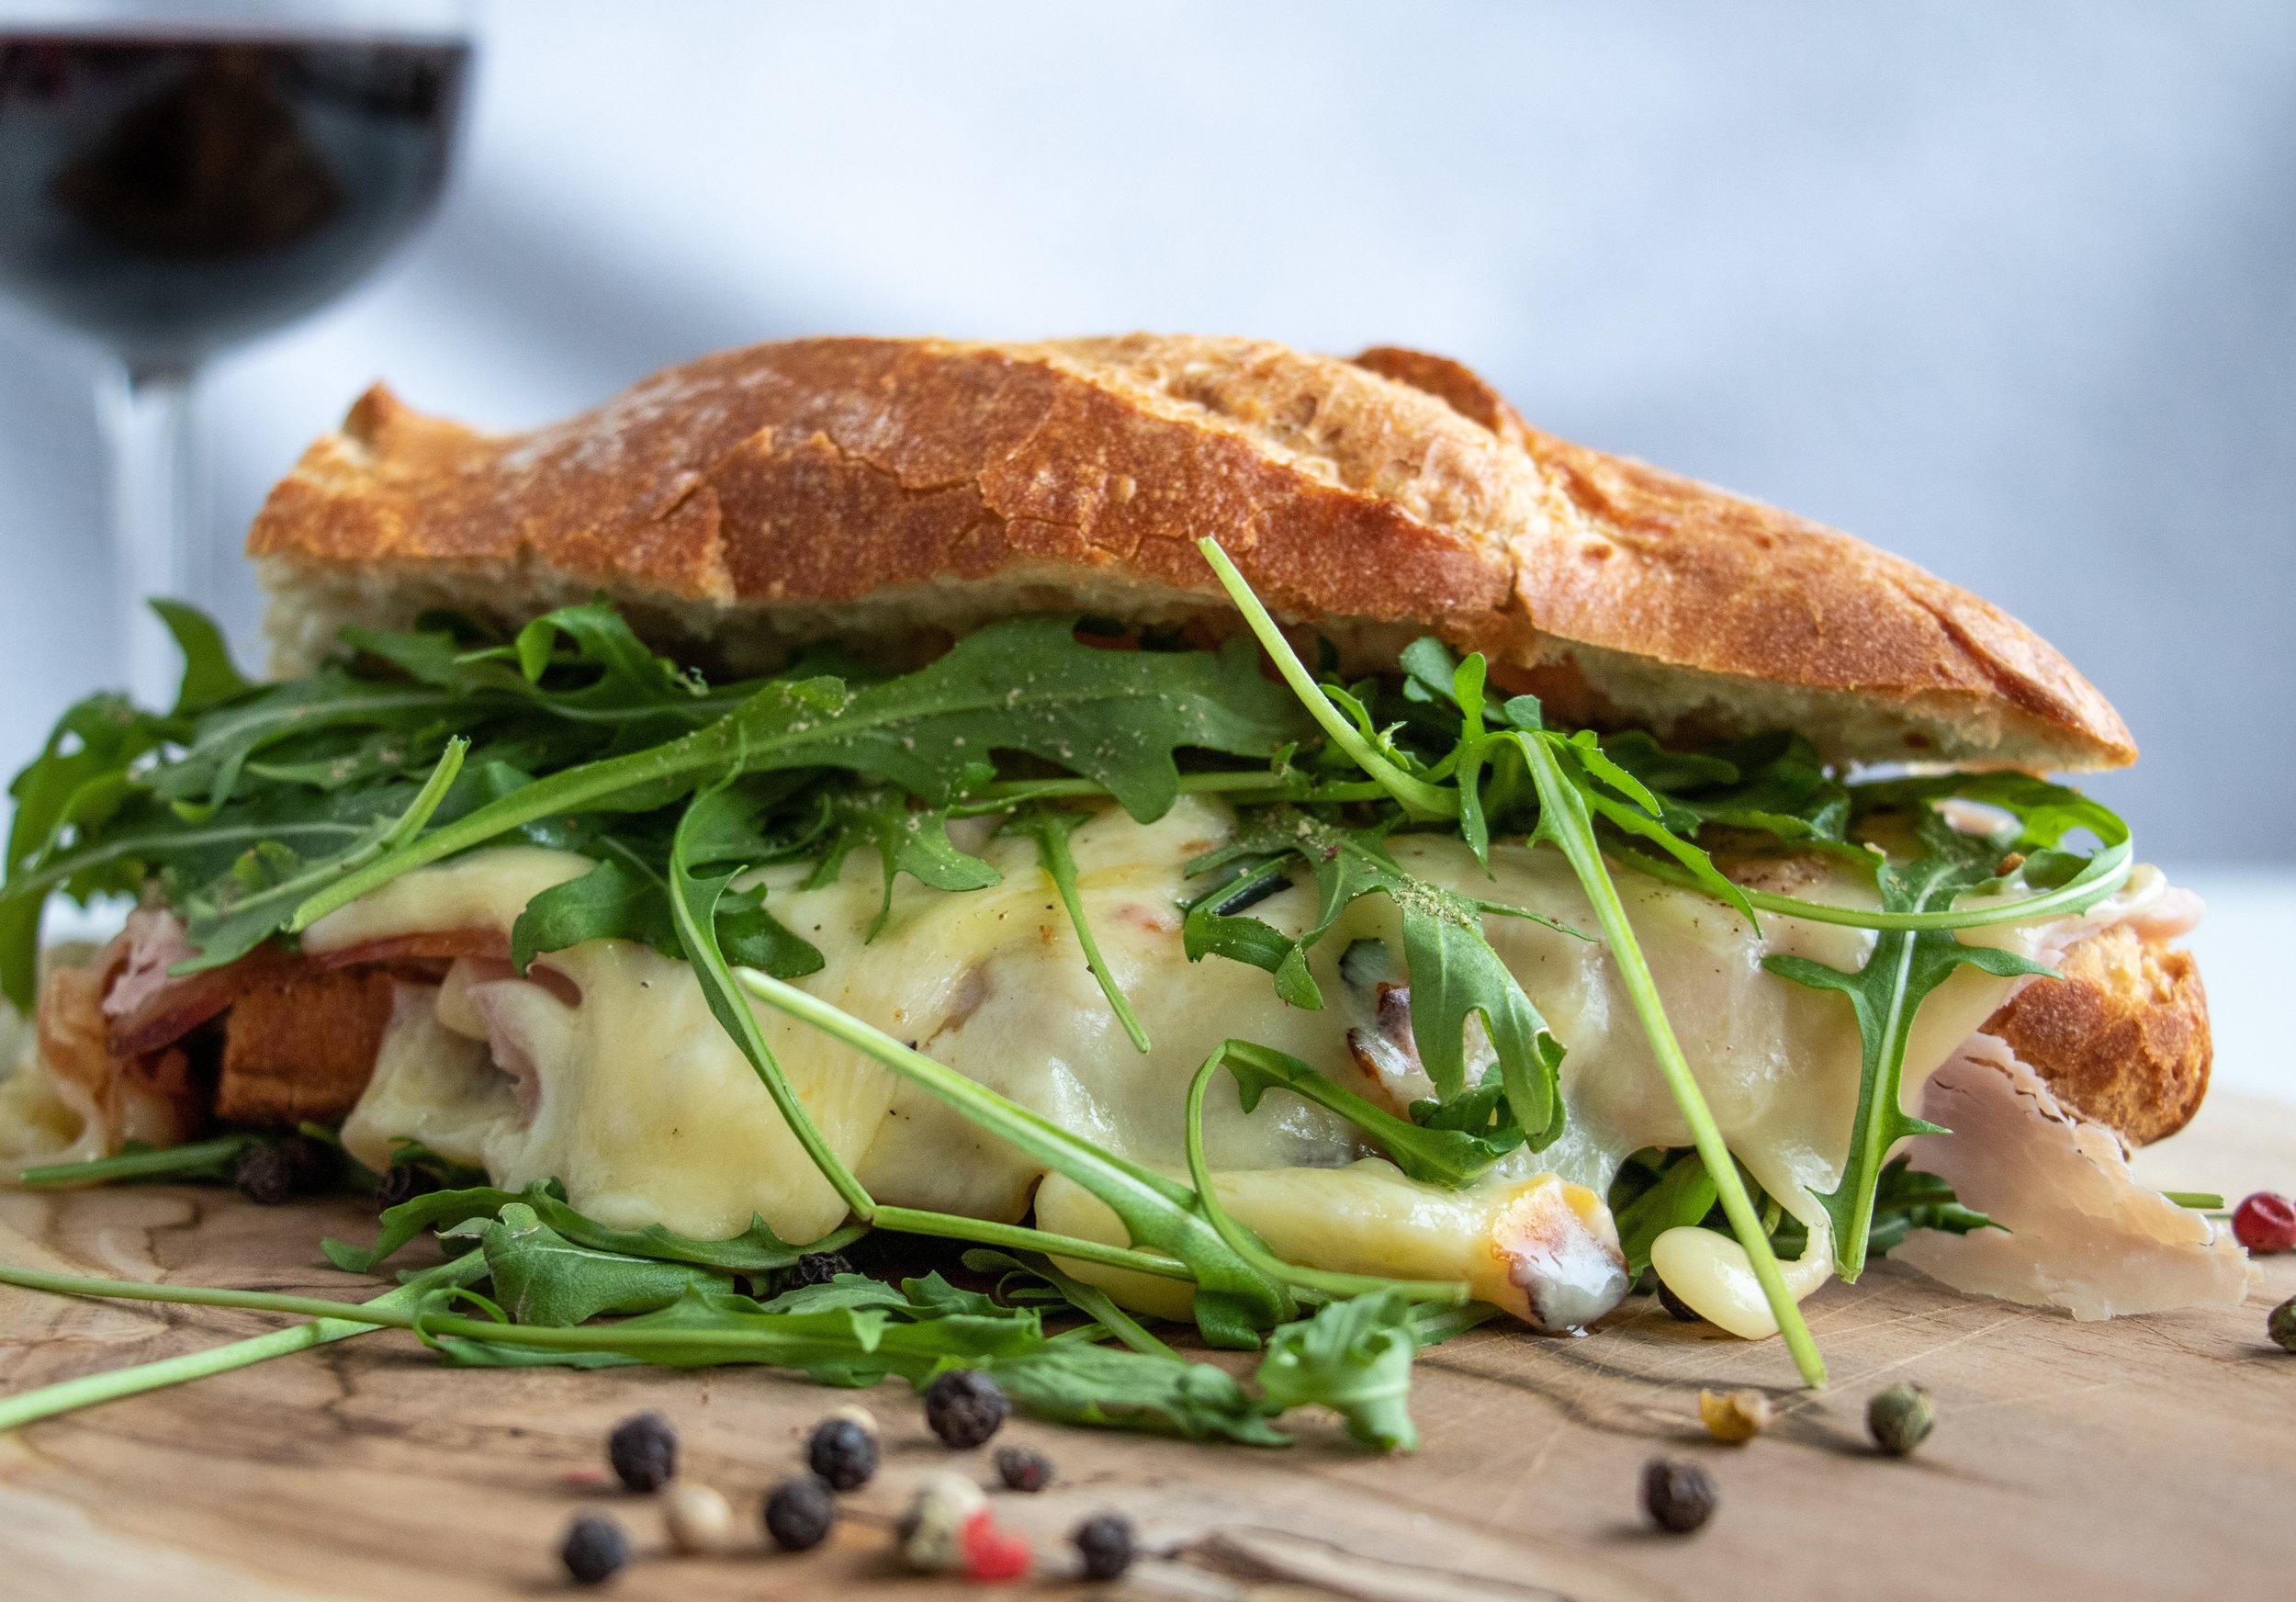 raclette on a baguette.JPG